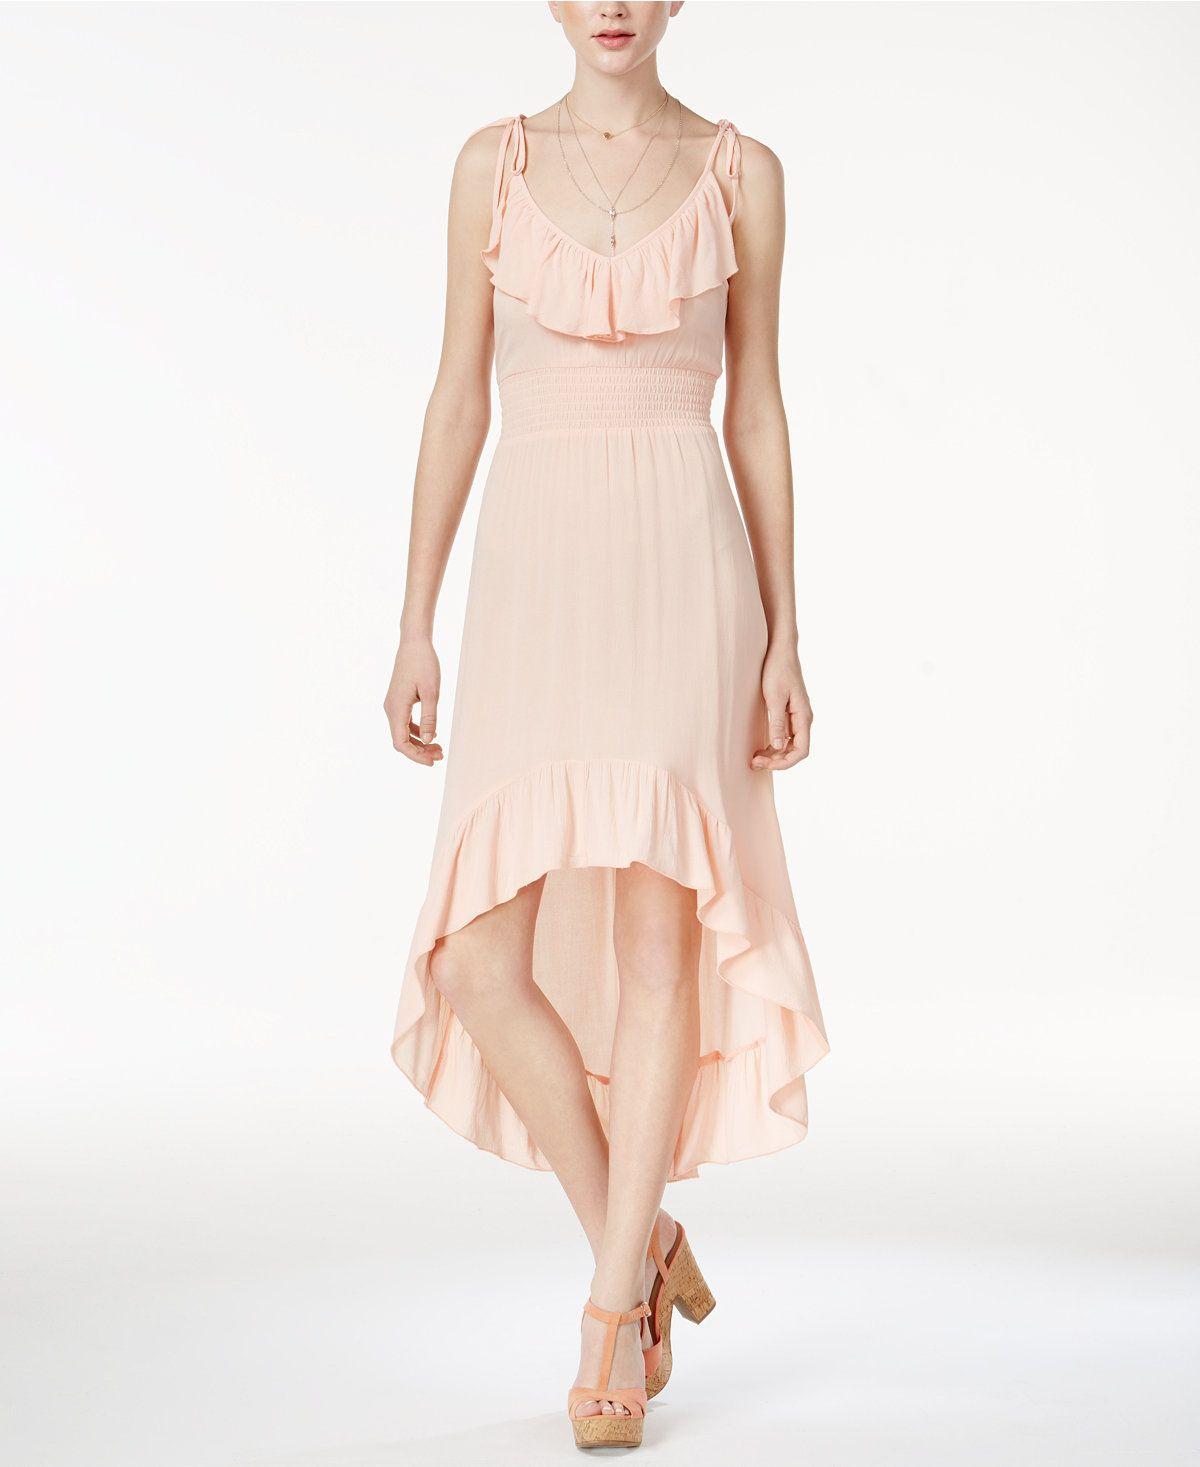 American rag juniorsu ruffled highlow dress created for macyus